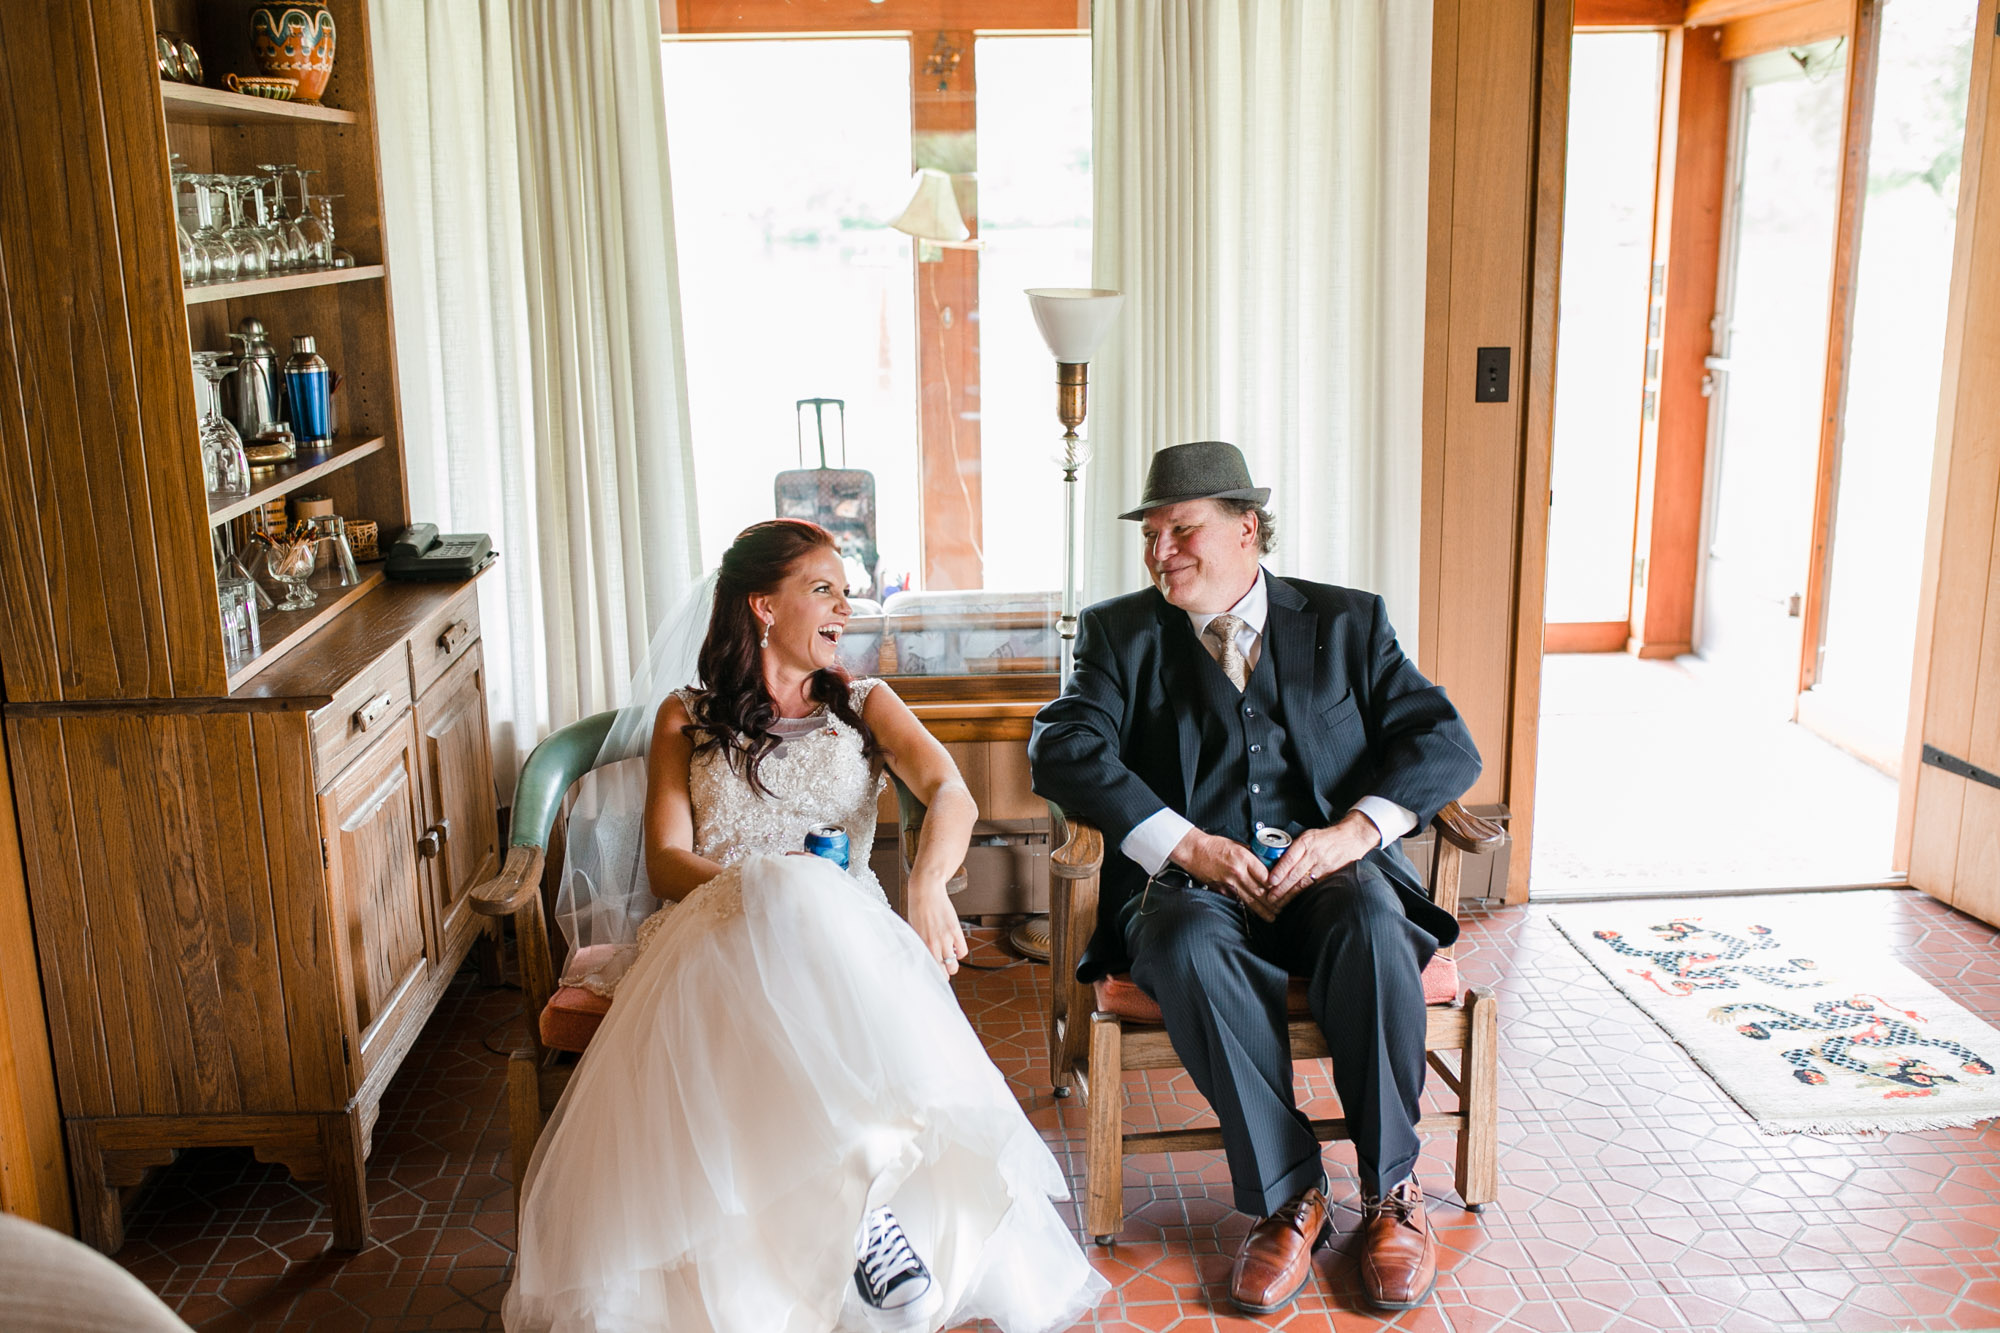 hensville-wedding-downtown-toledo-ohio (24 of 103).jpg